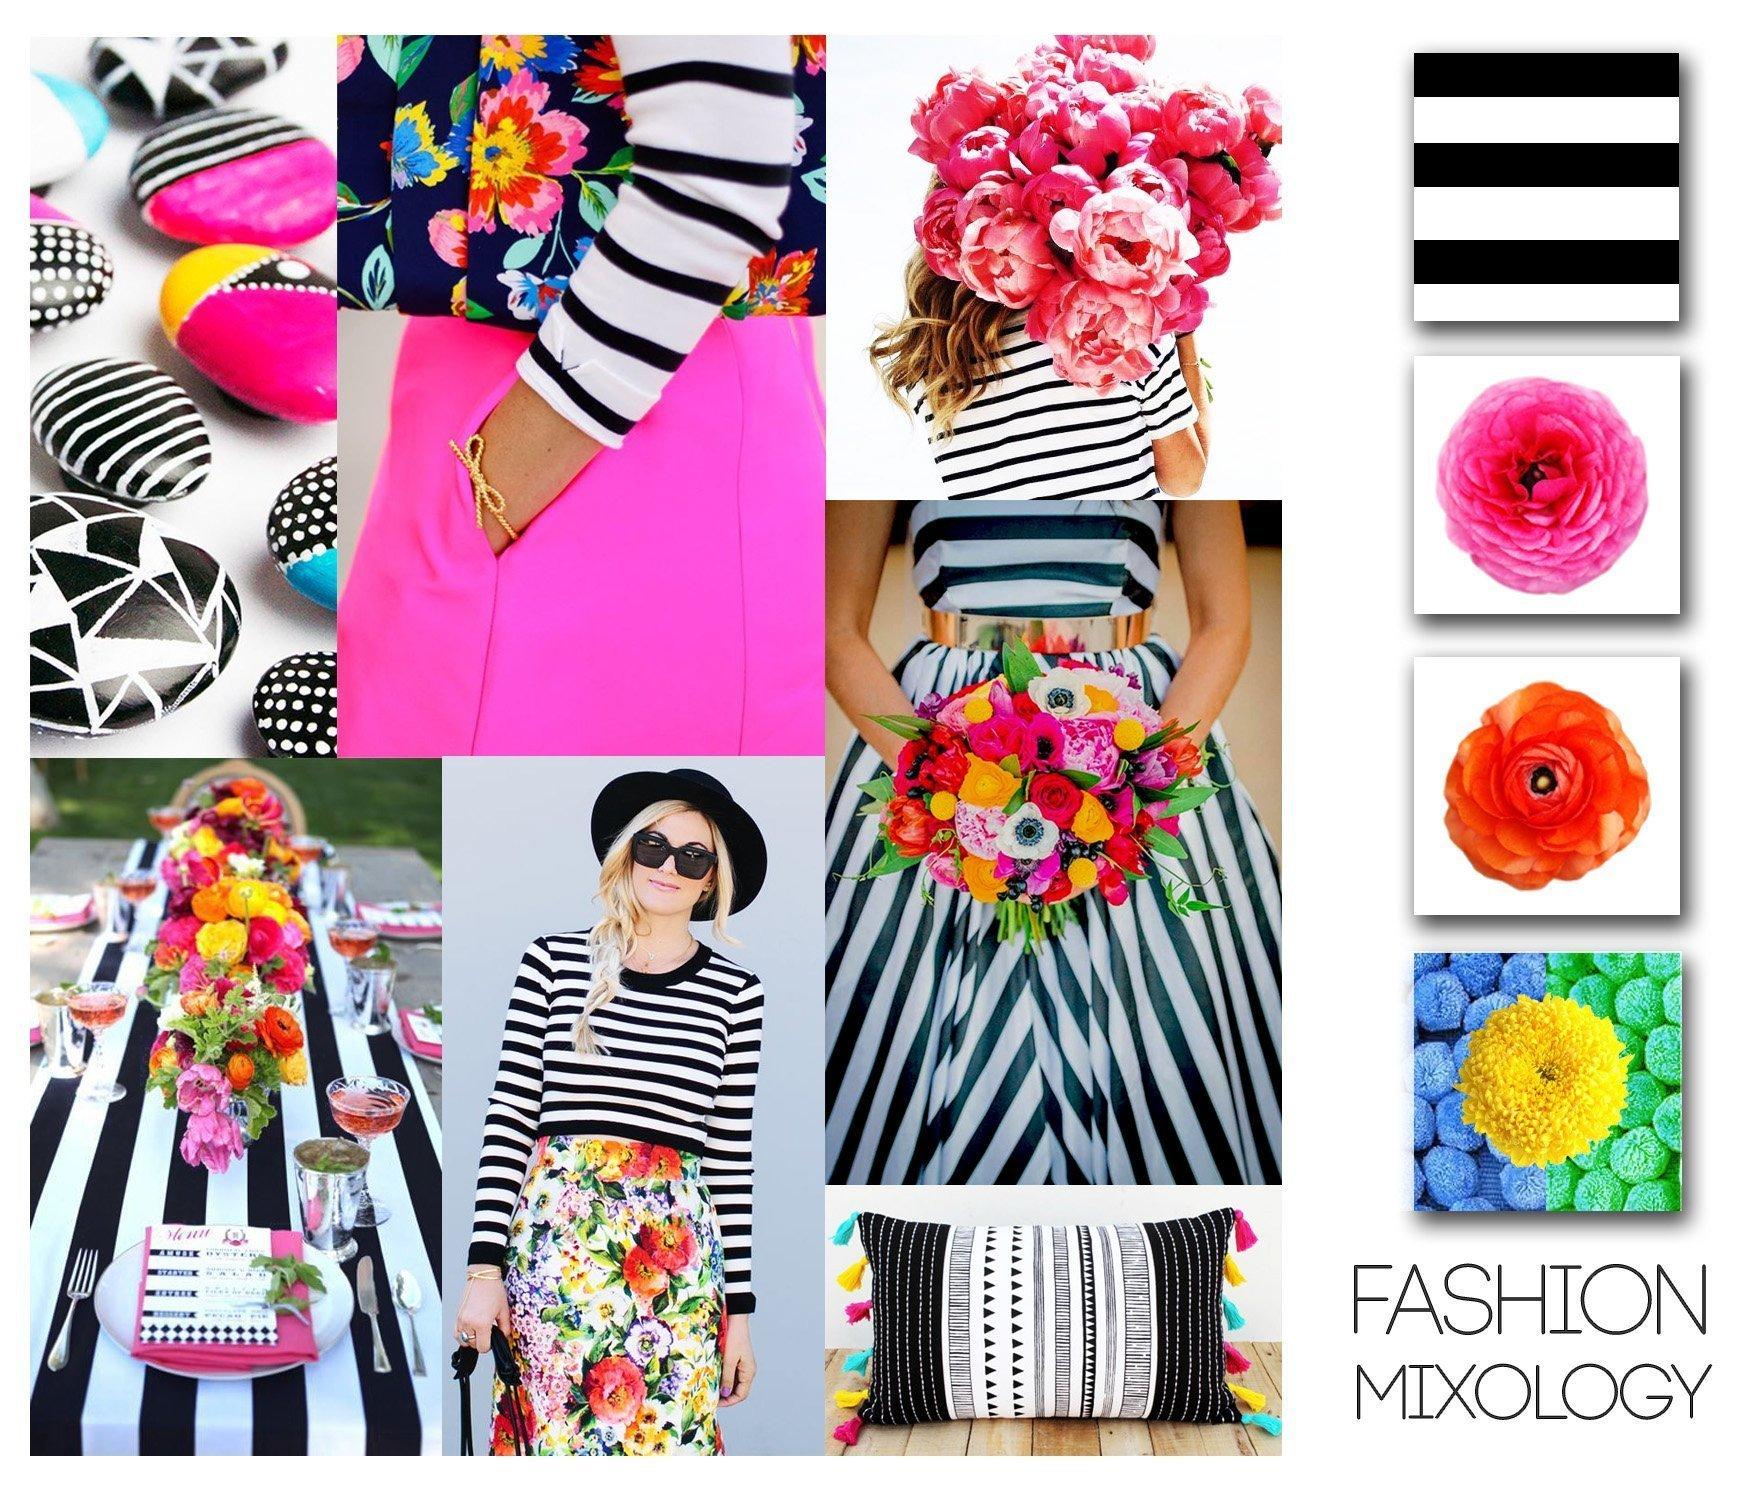 Decor Meets Fashion – Mixing Prints: Desaturated Stripes & Bright Florals